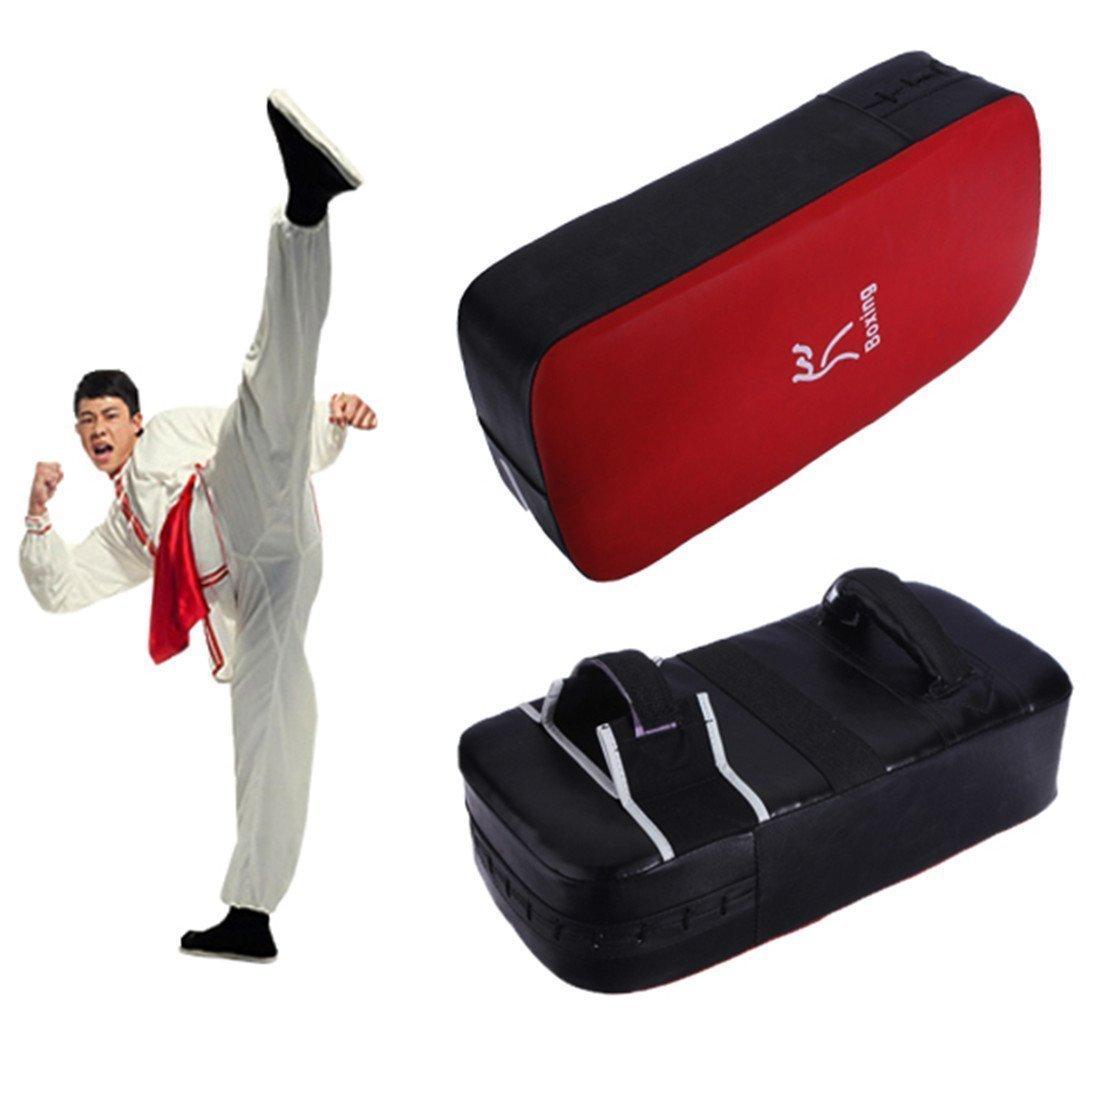 MECO(TM) One Karate Taekwondo Boxing Kick Punch Pad Shield